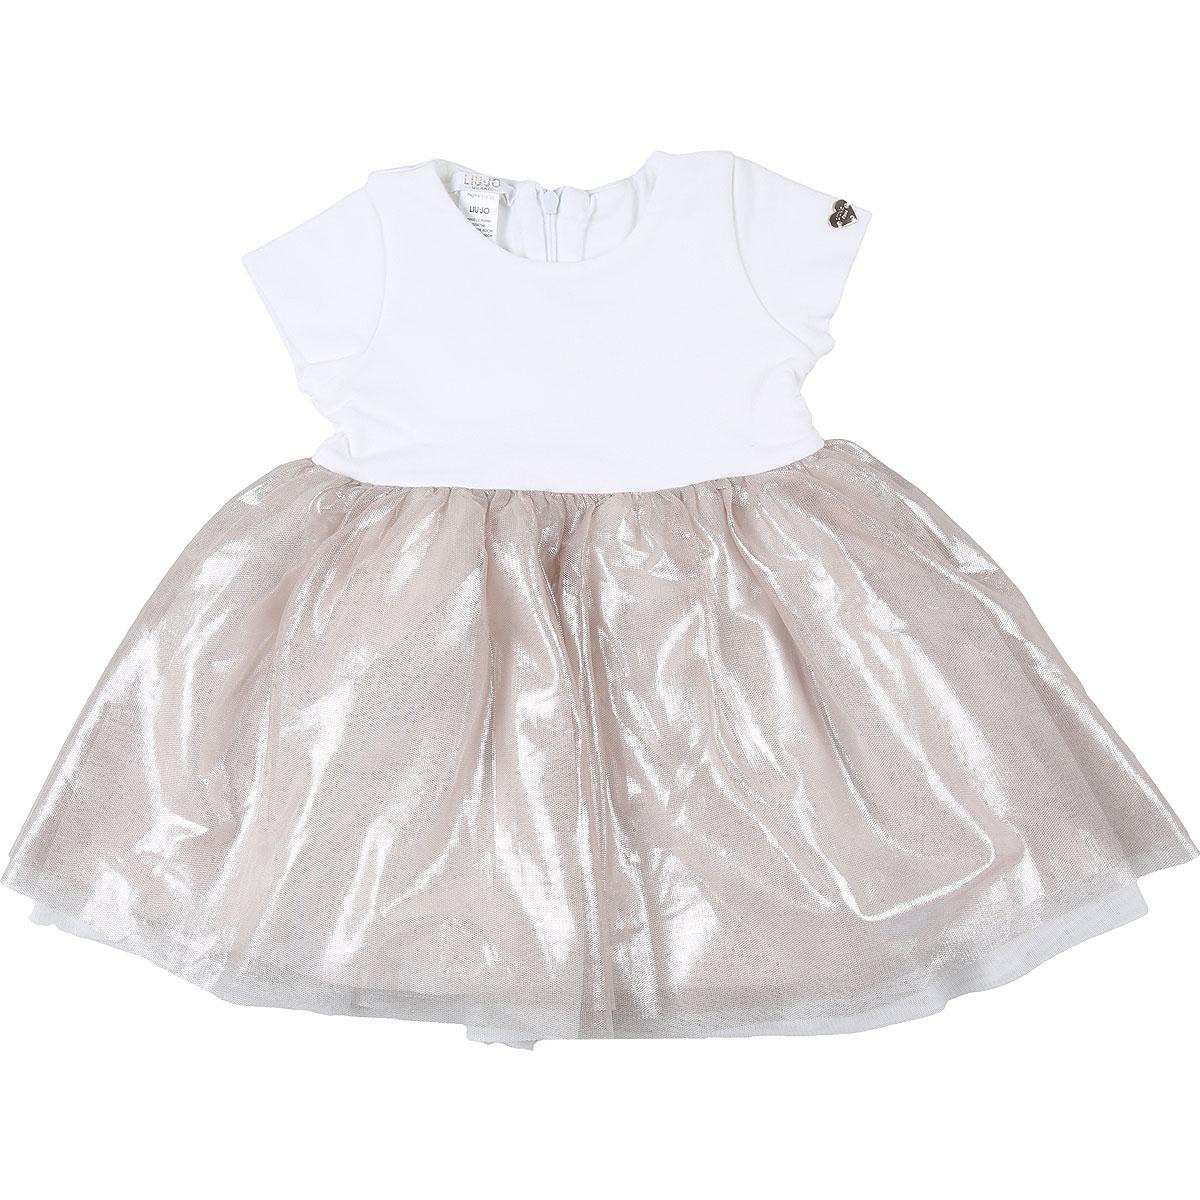 Liu Jo Baby Dress for Girls On Sale, White, Cotton, 2019, 12M 18M 3M 6M